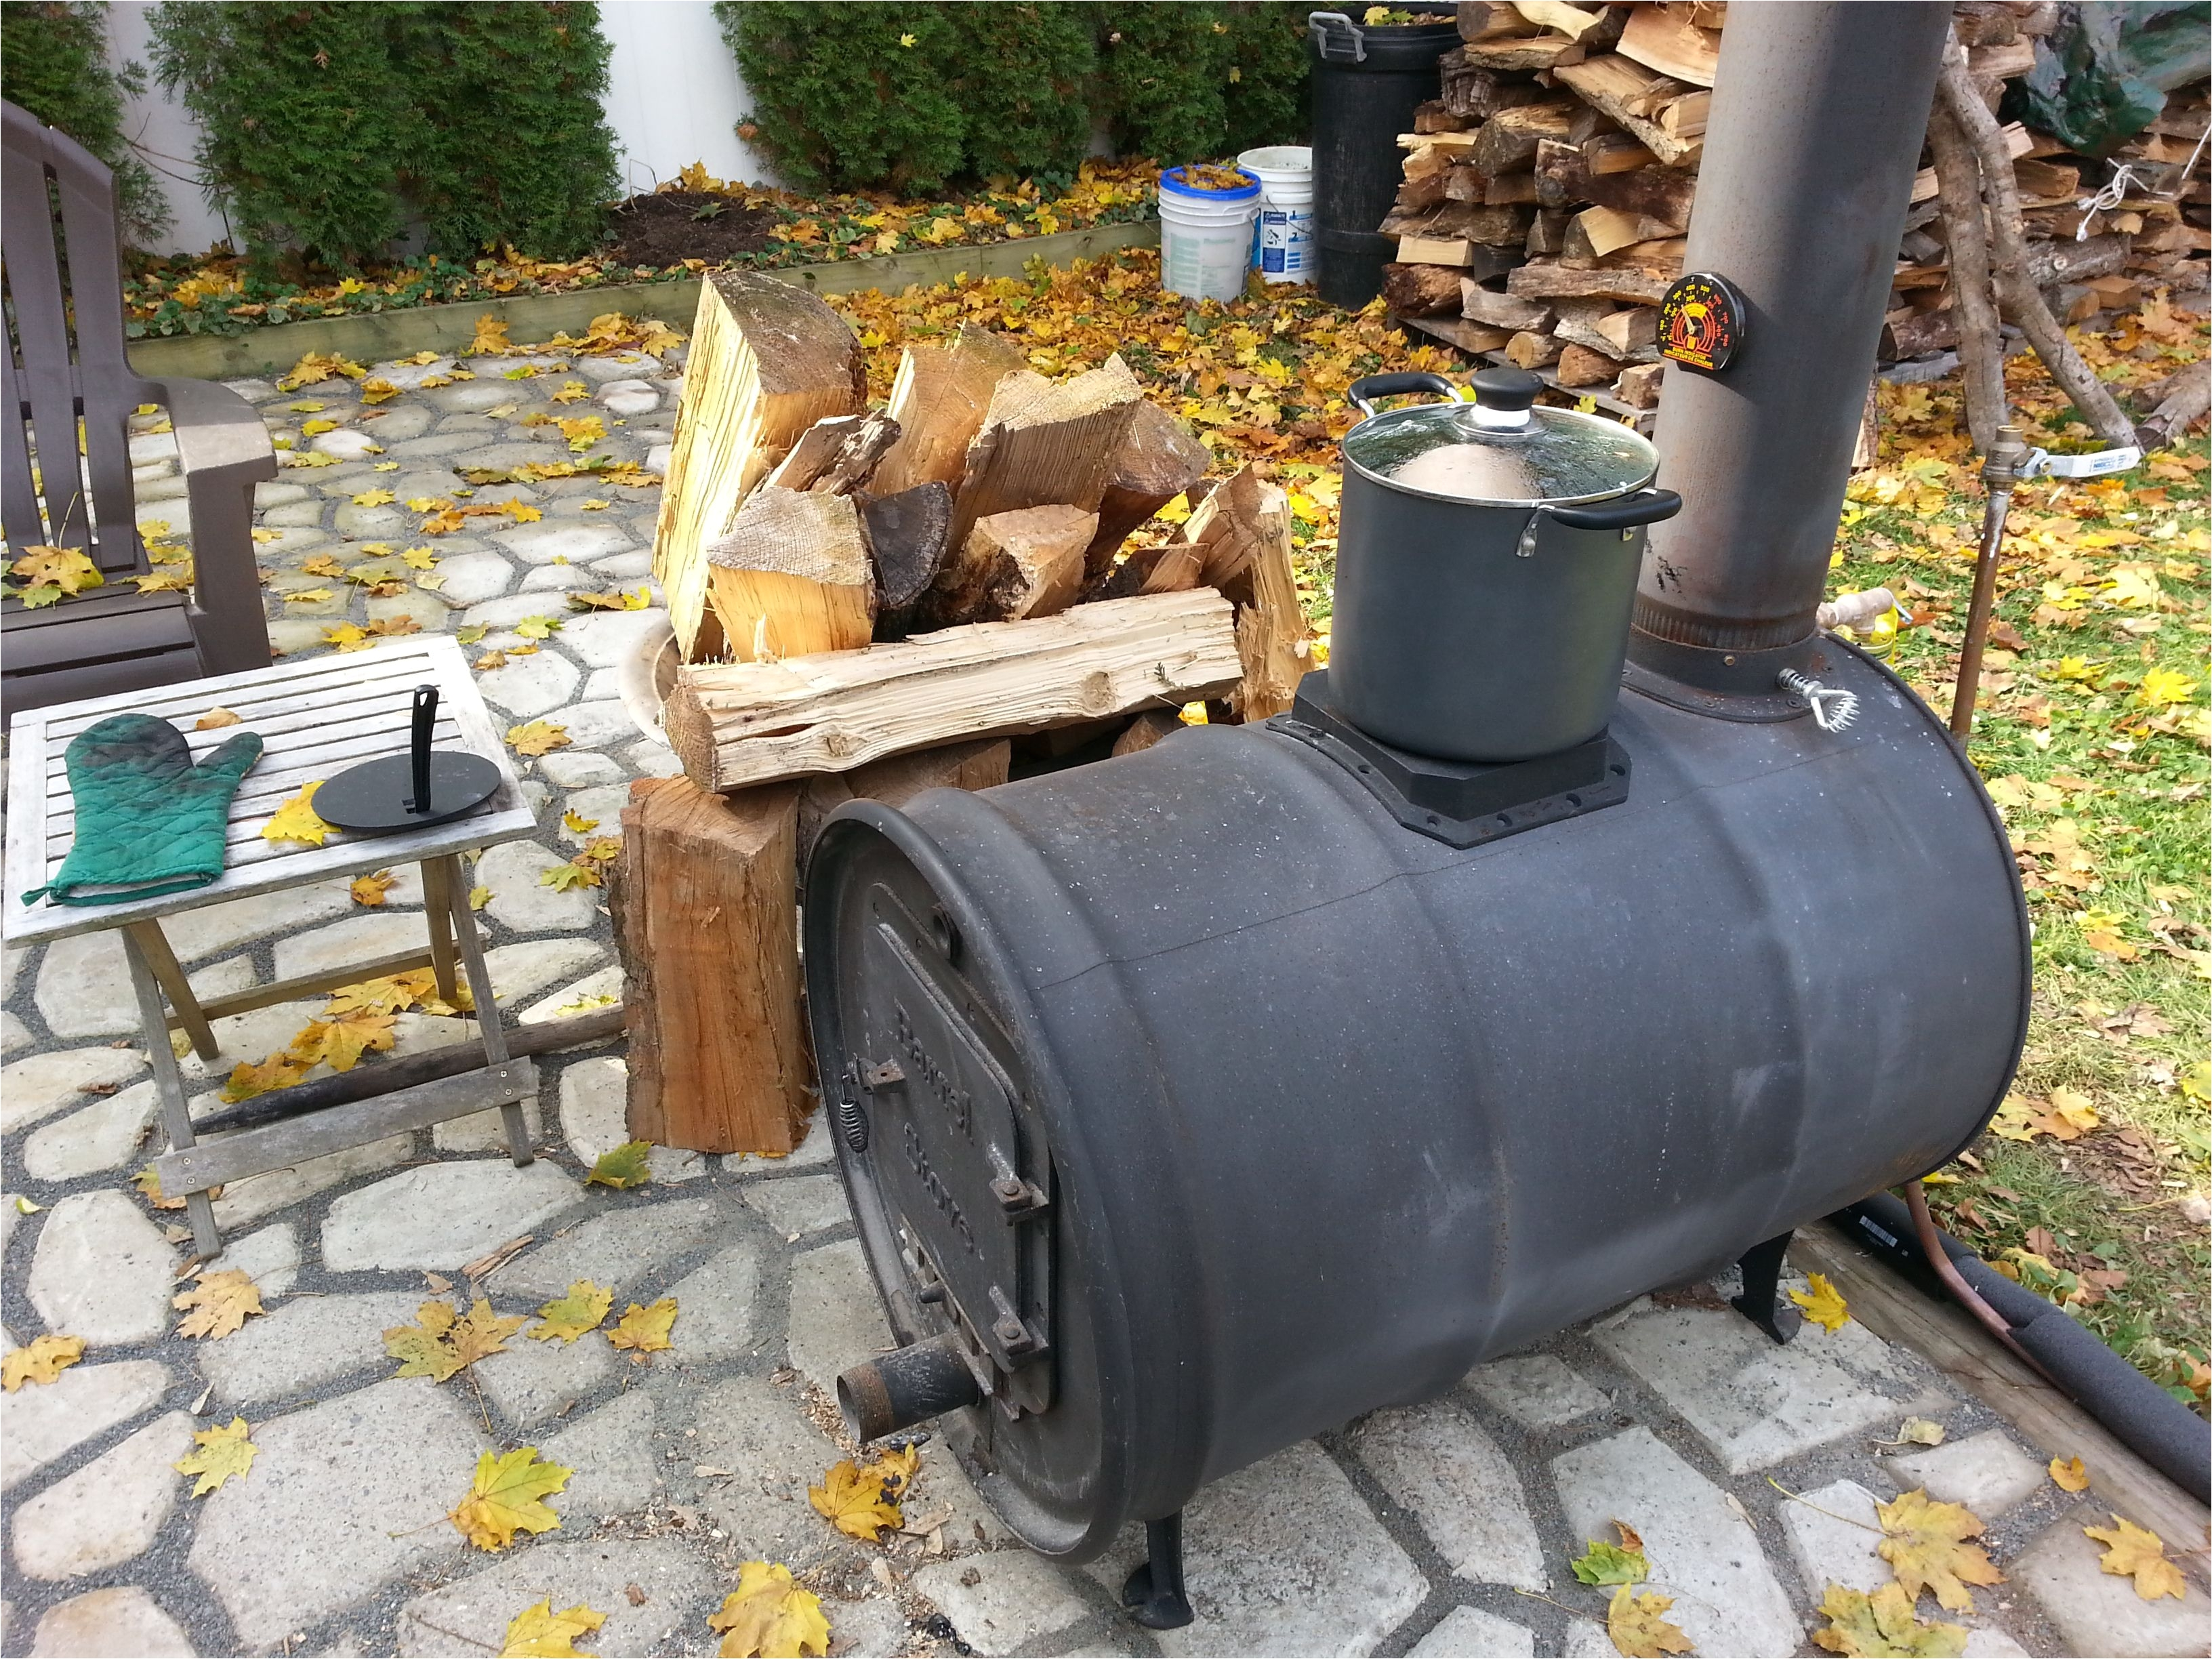 barrel stove 55 gallon drum stove kit barrel stove kit outdoor furnace diy hydronic wood boiler vogelzang us stove